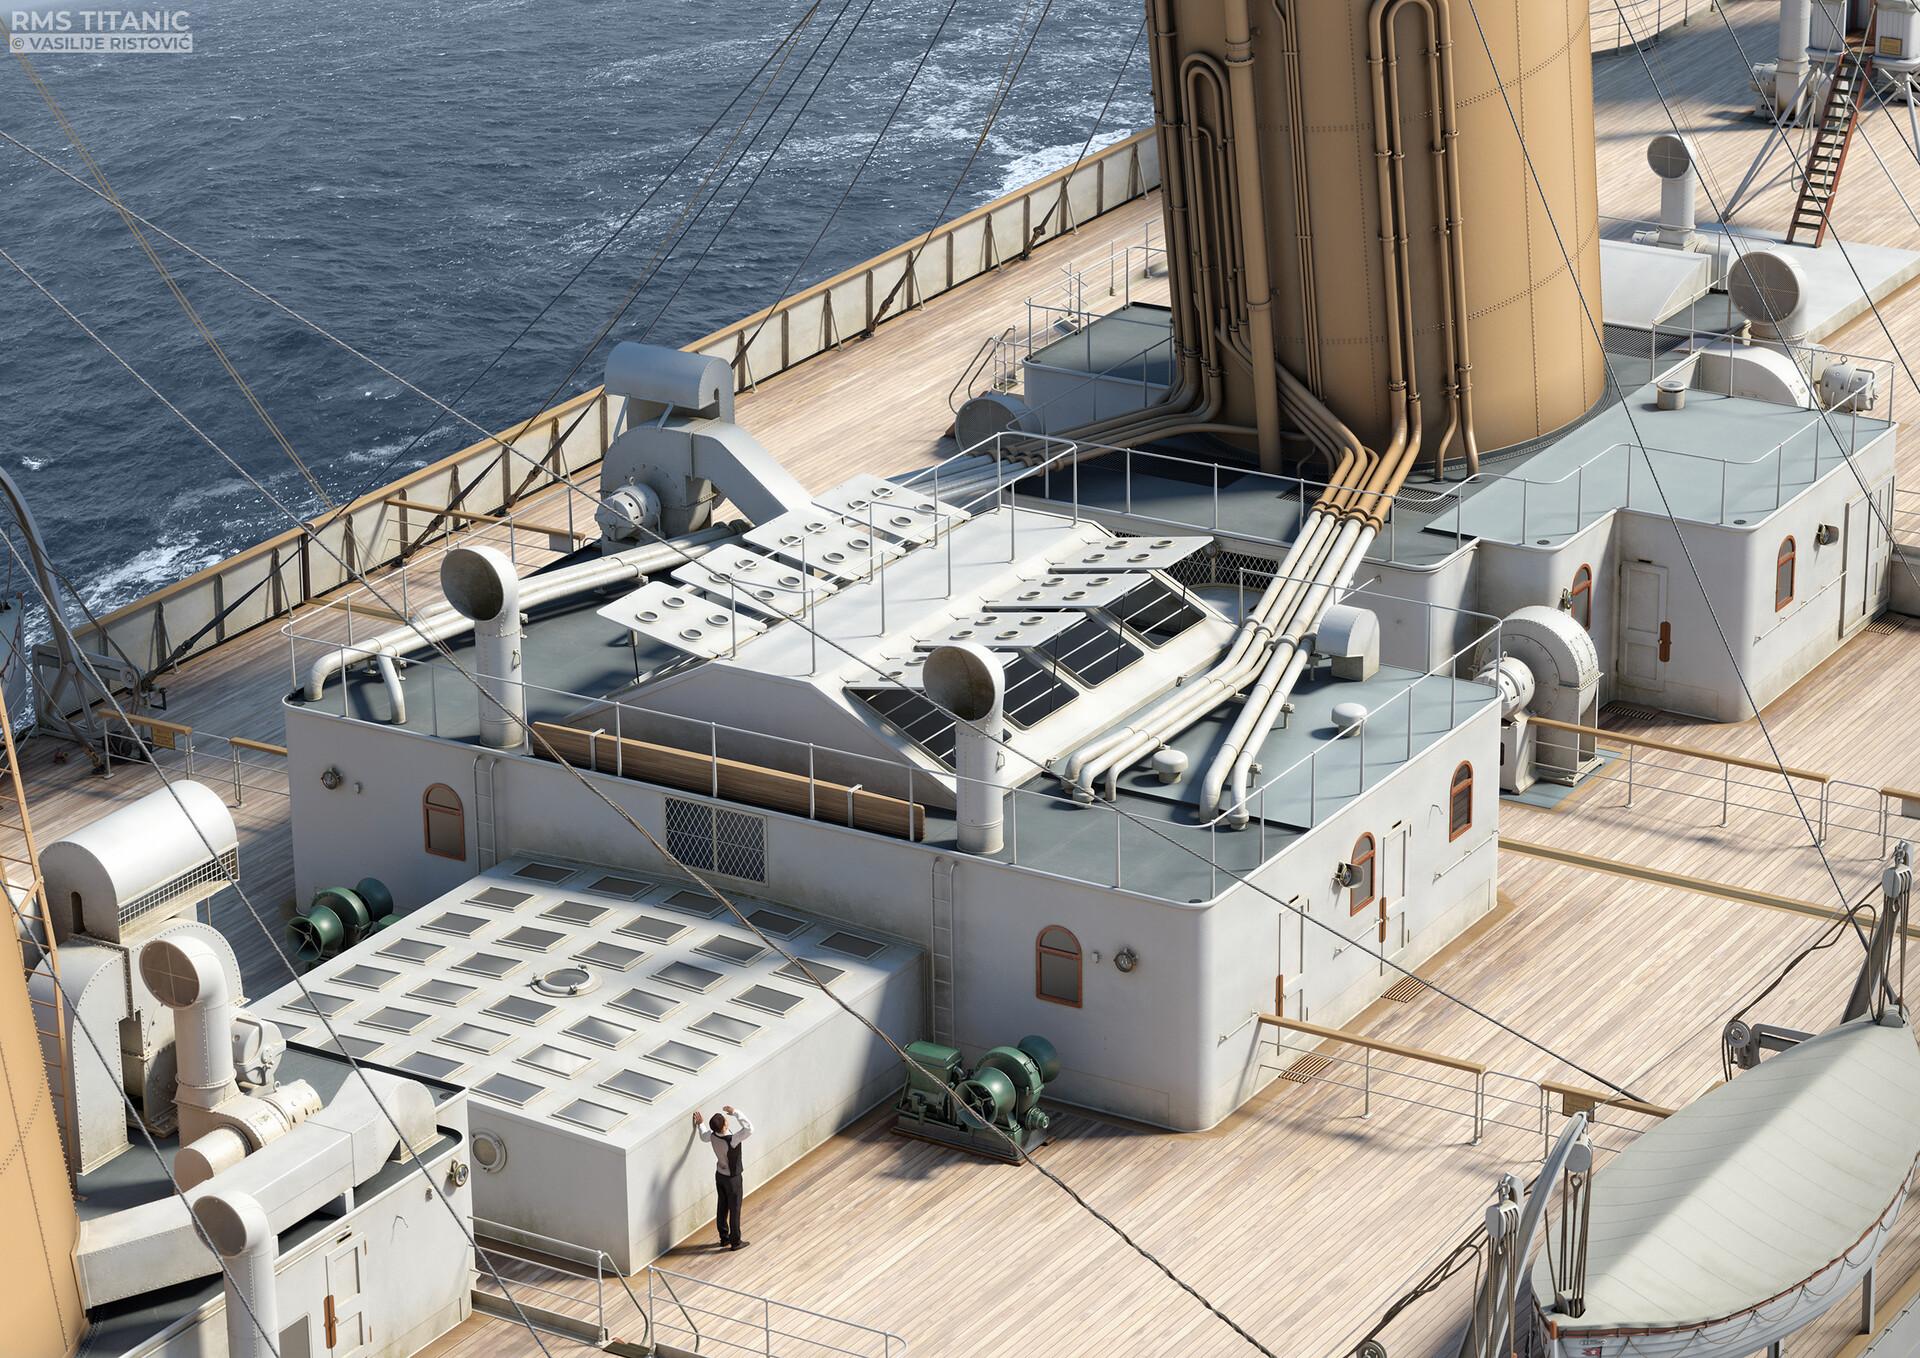 Montage Titanic Trumpeter 1/200 - Page 10 Vasilije-ristovic-titanic-tank-top-01-web